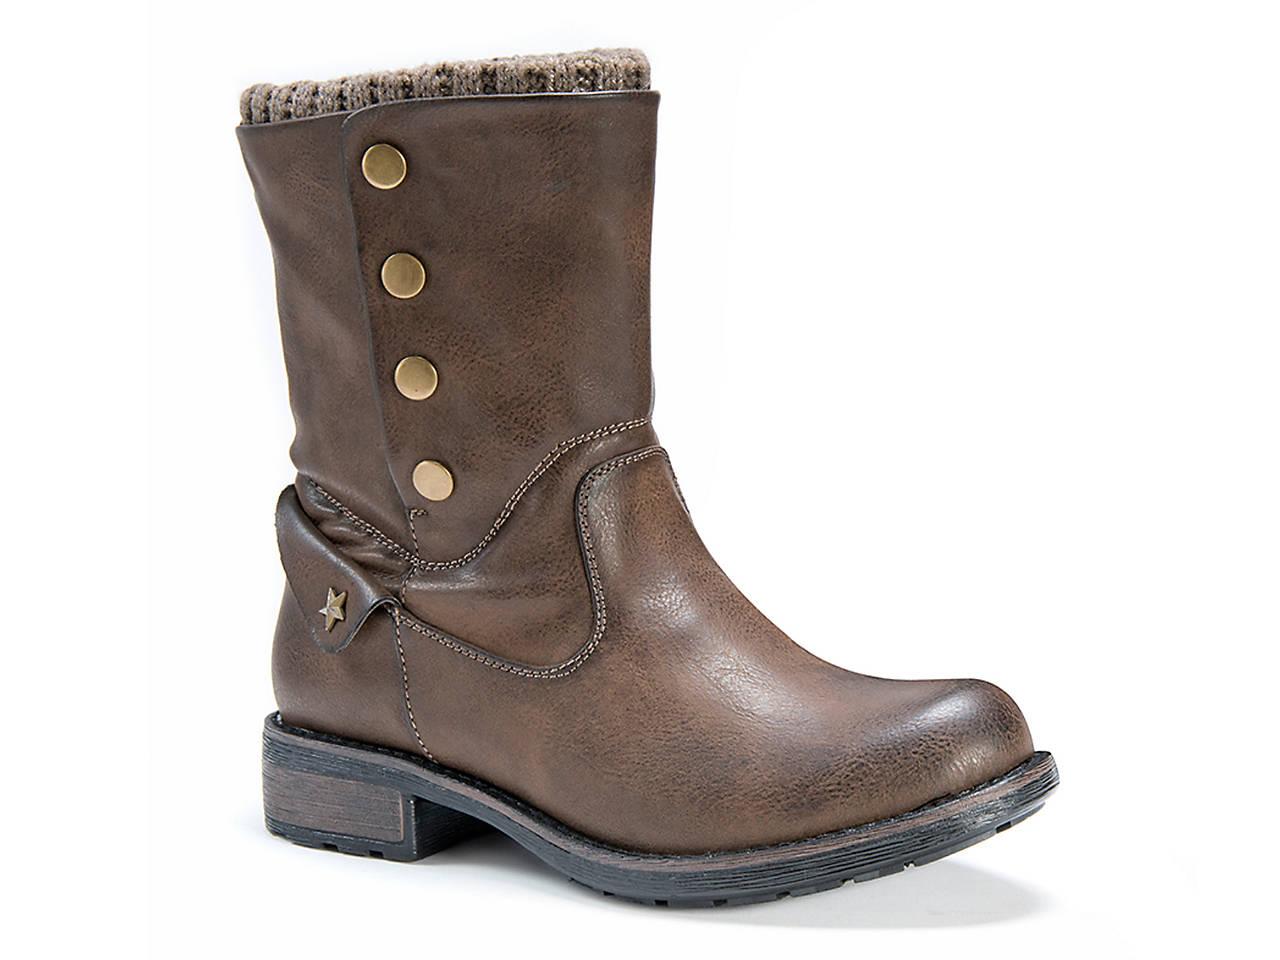 5b46dc29bb89 Muk Luks Crumpet Bootie Women s Shoes